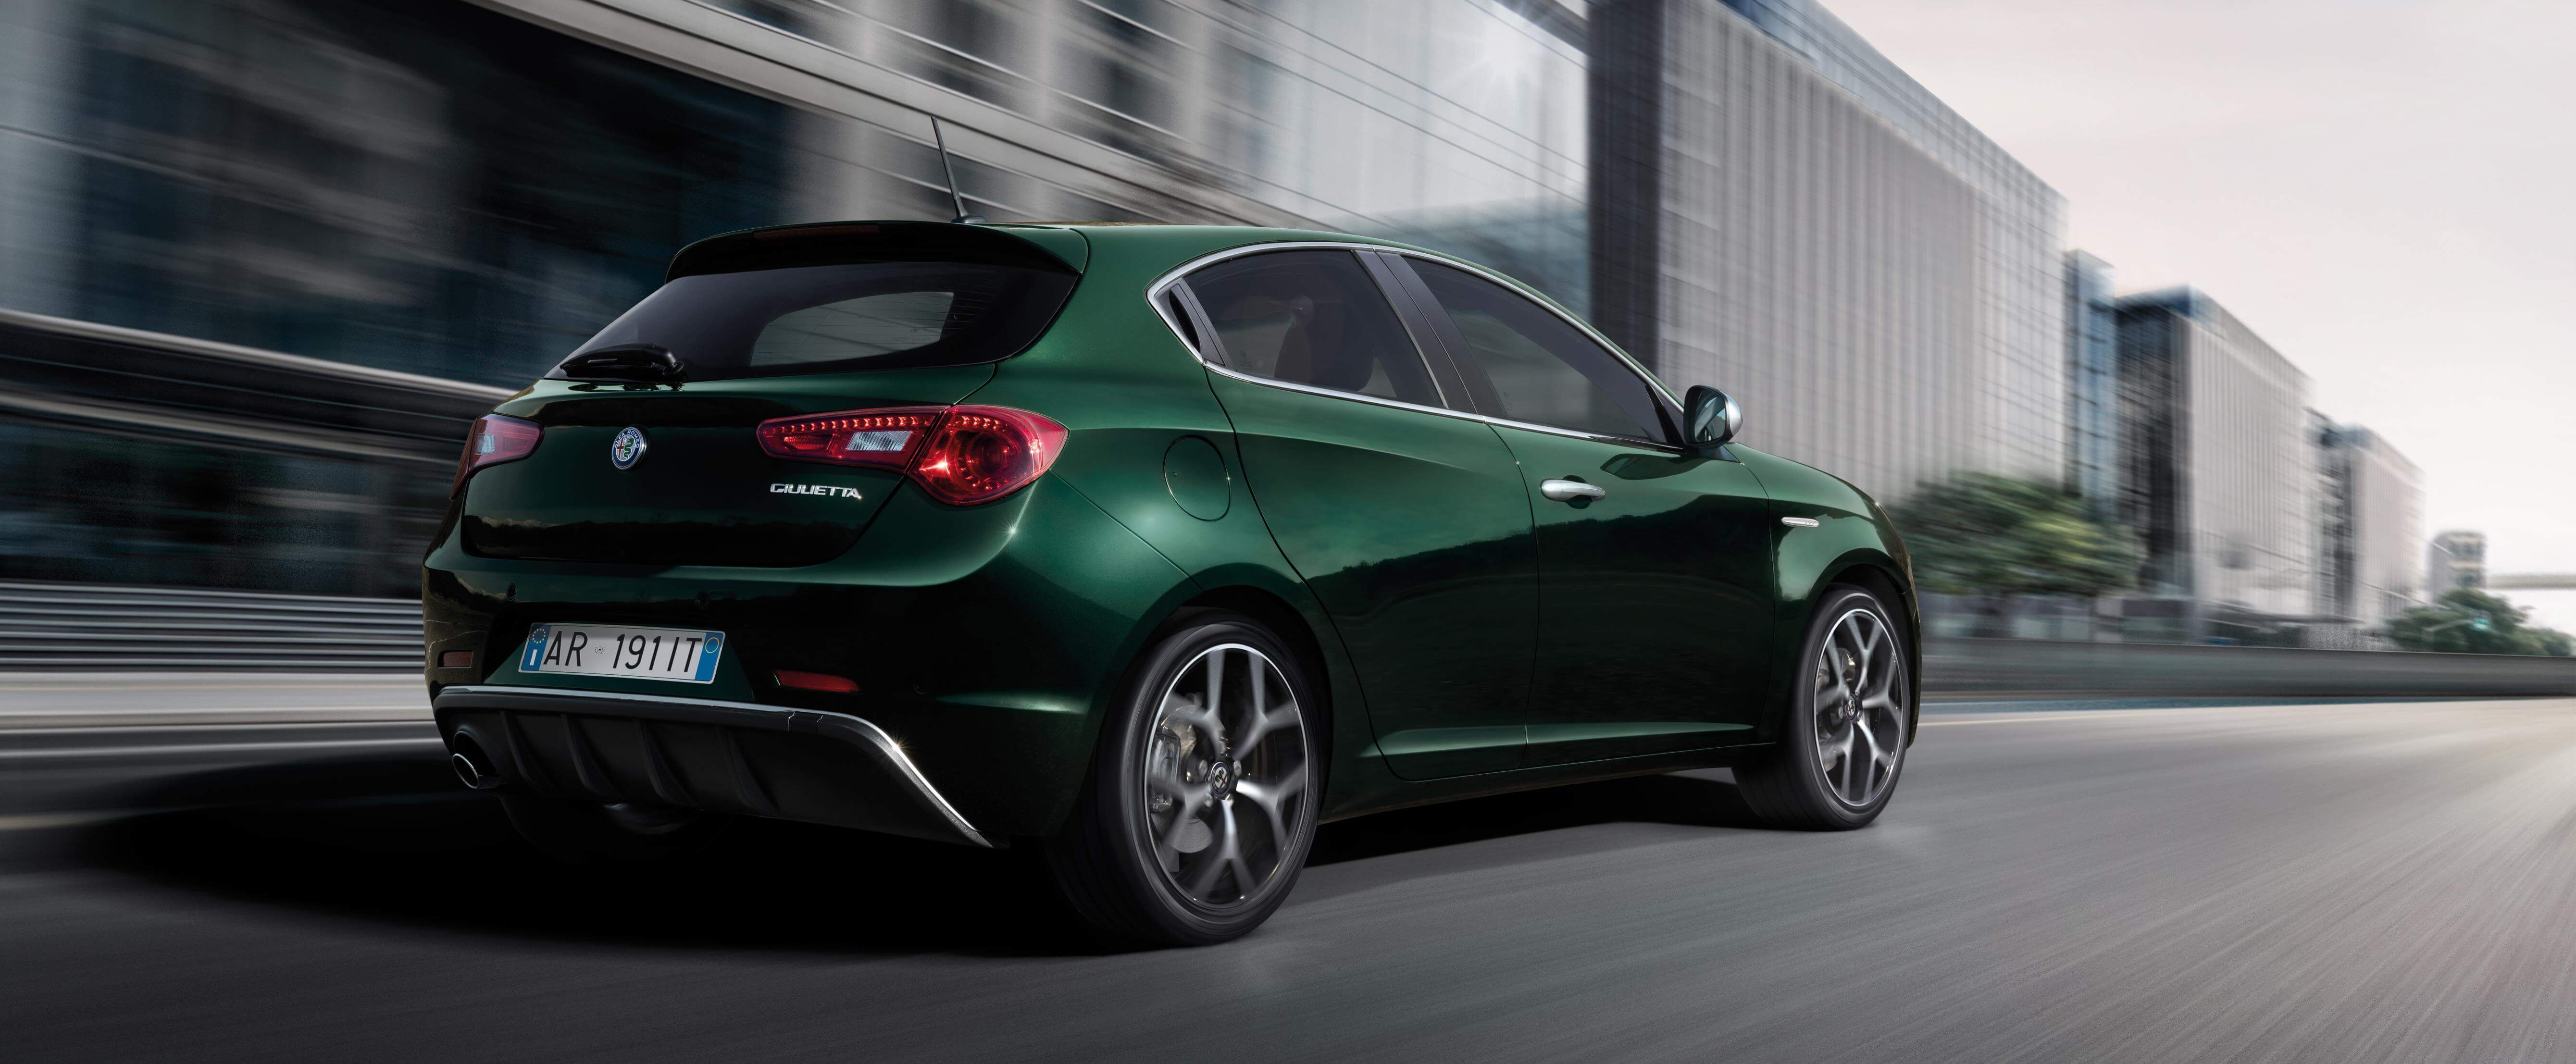 Alfa Romeo Giulietta 2019: trasera